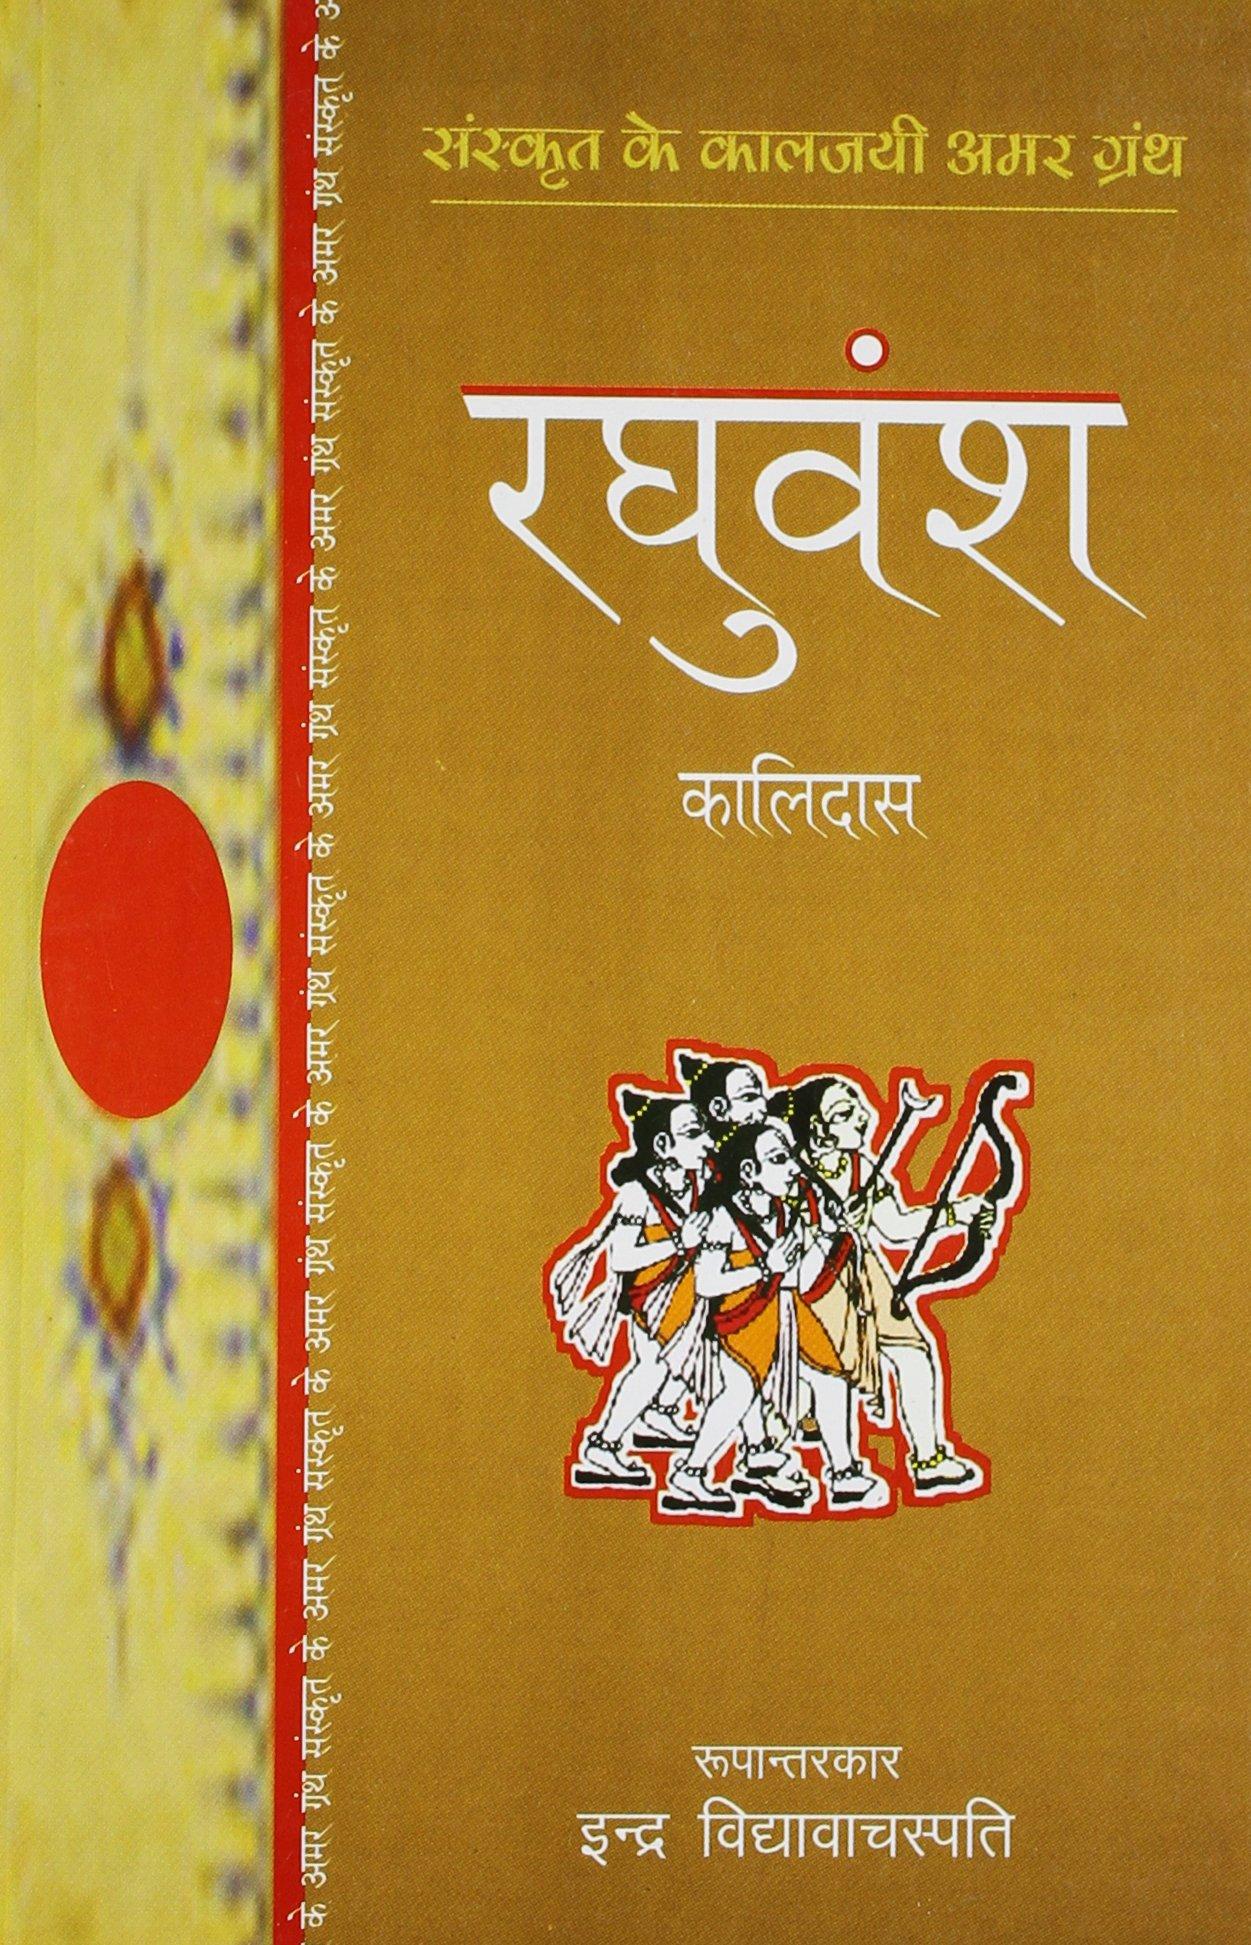 Raghuvansh by kalidas